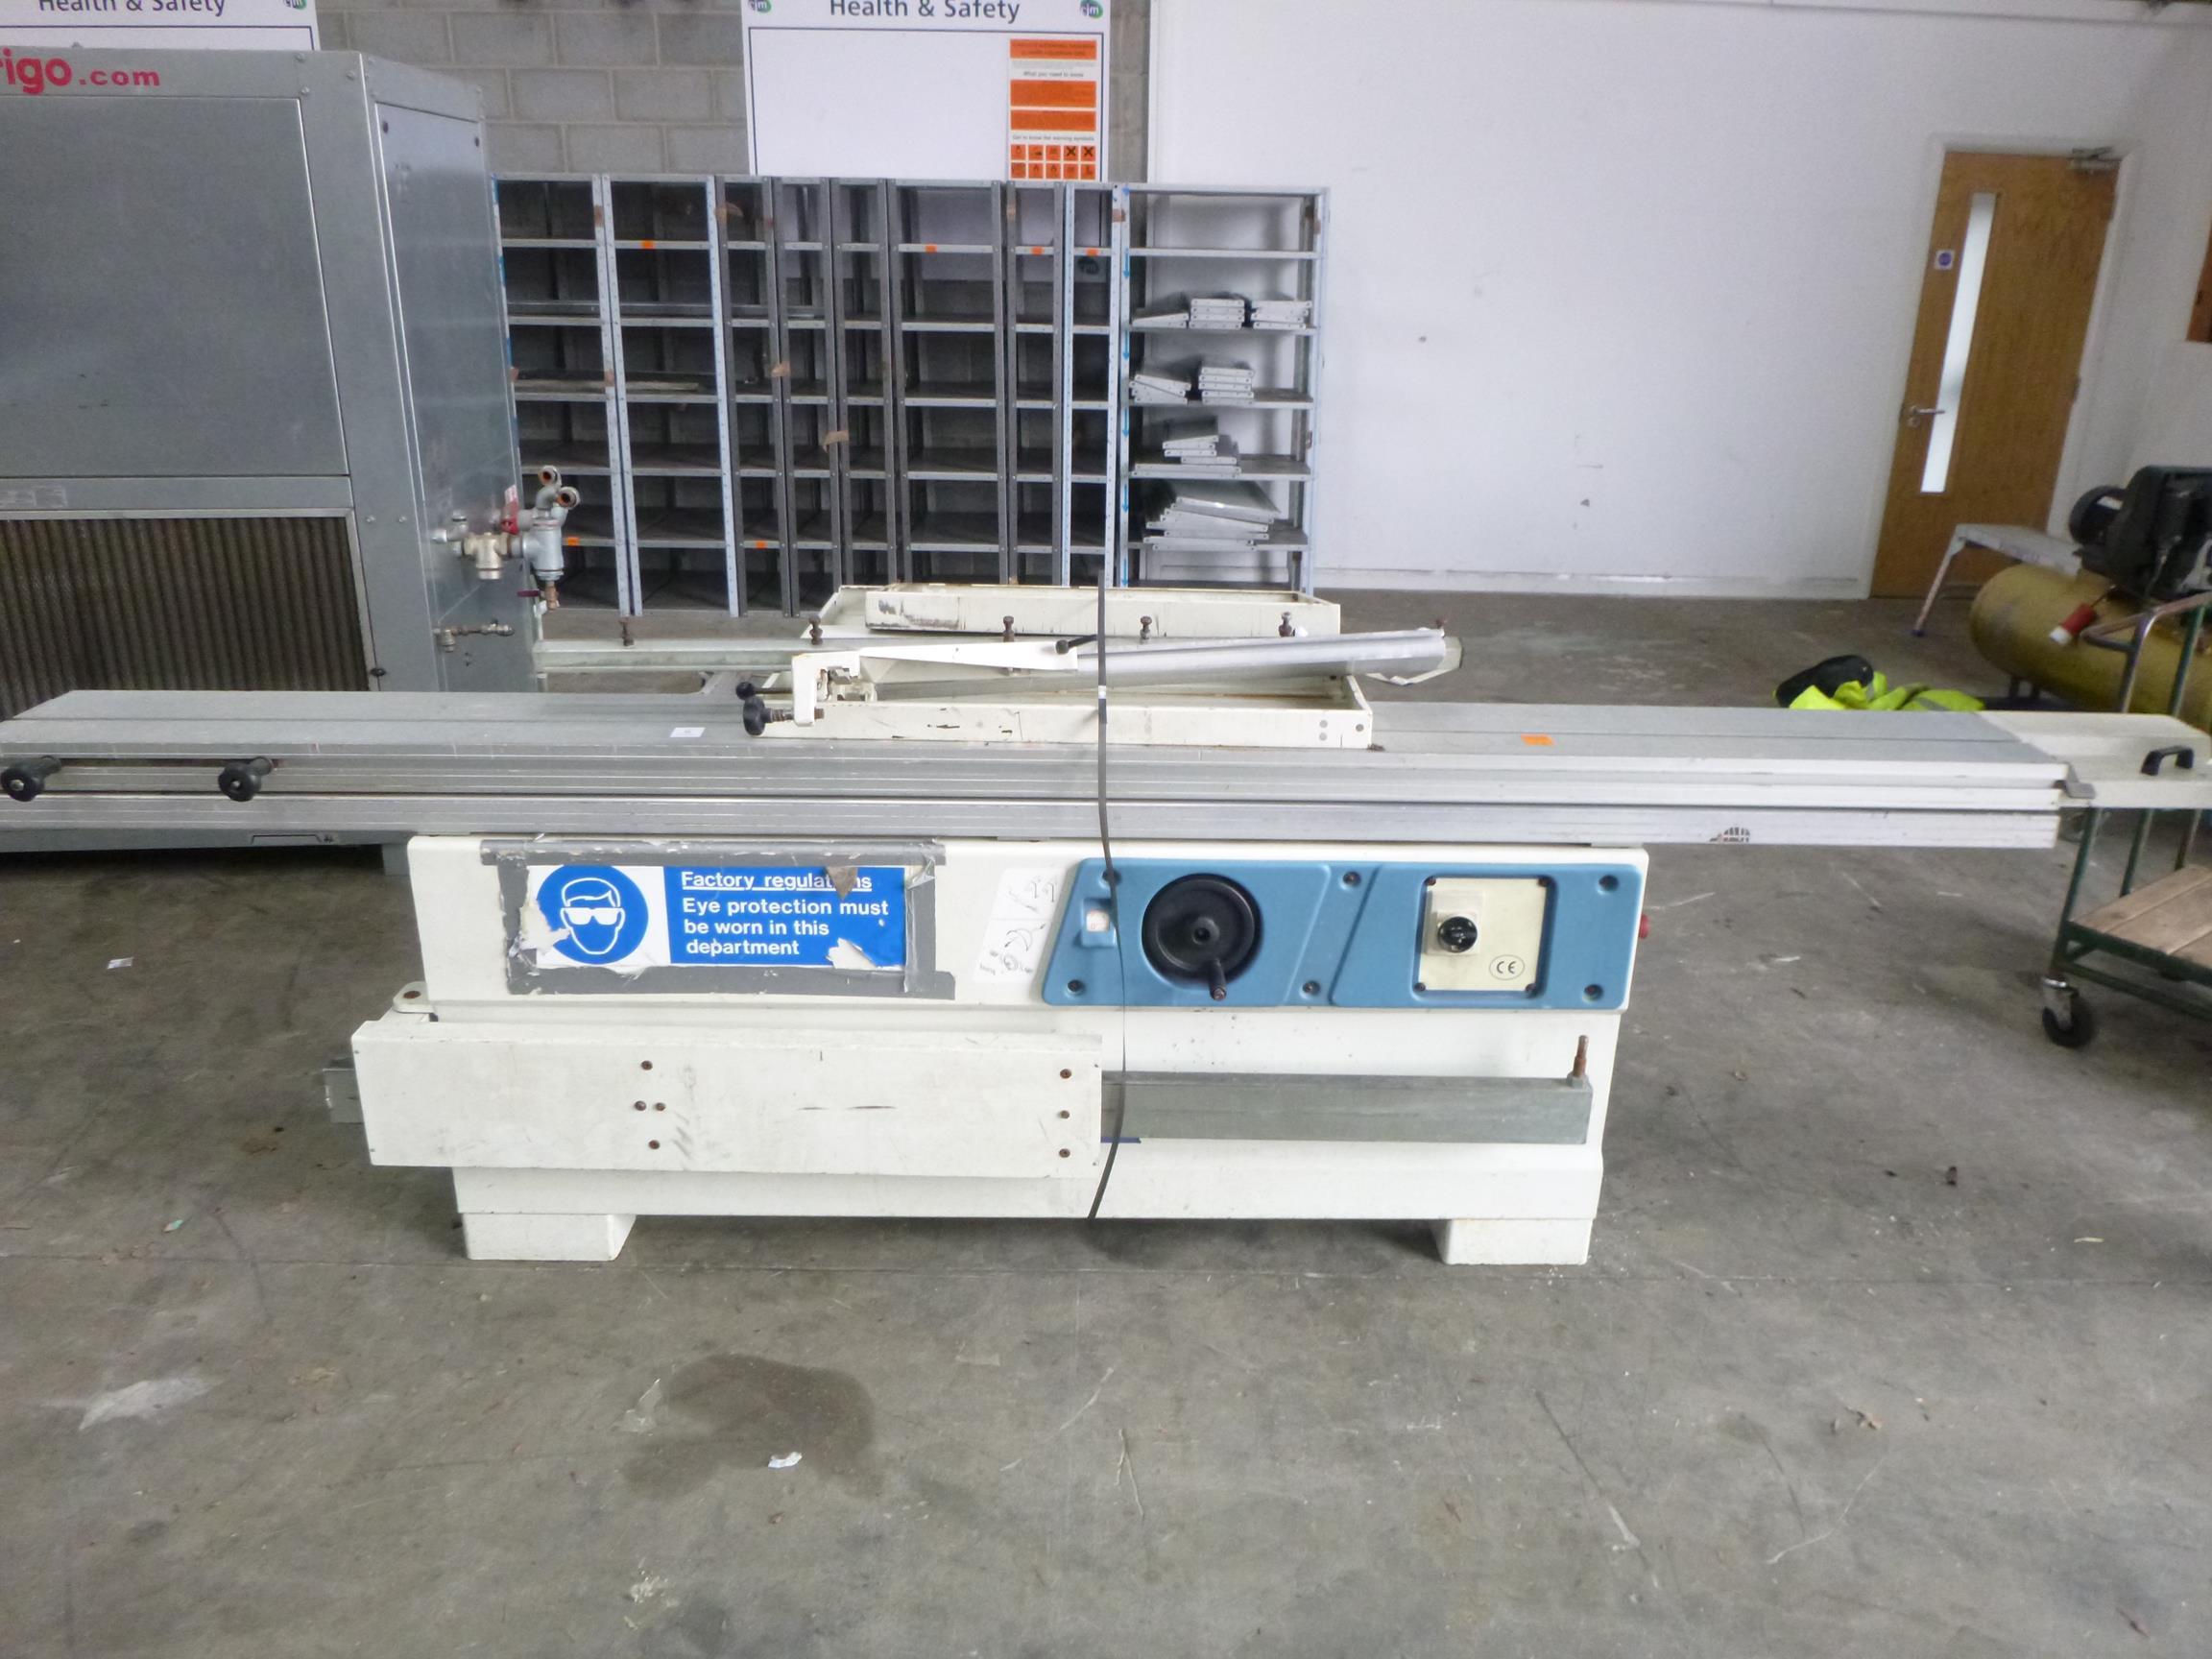 2001 SCM Minimax 3-2 SC/4WS Saw, Matr KK/060305  Comp R006802, No